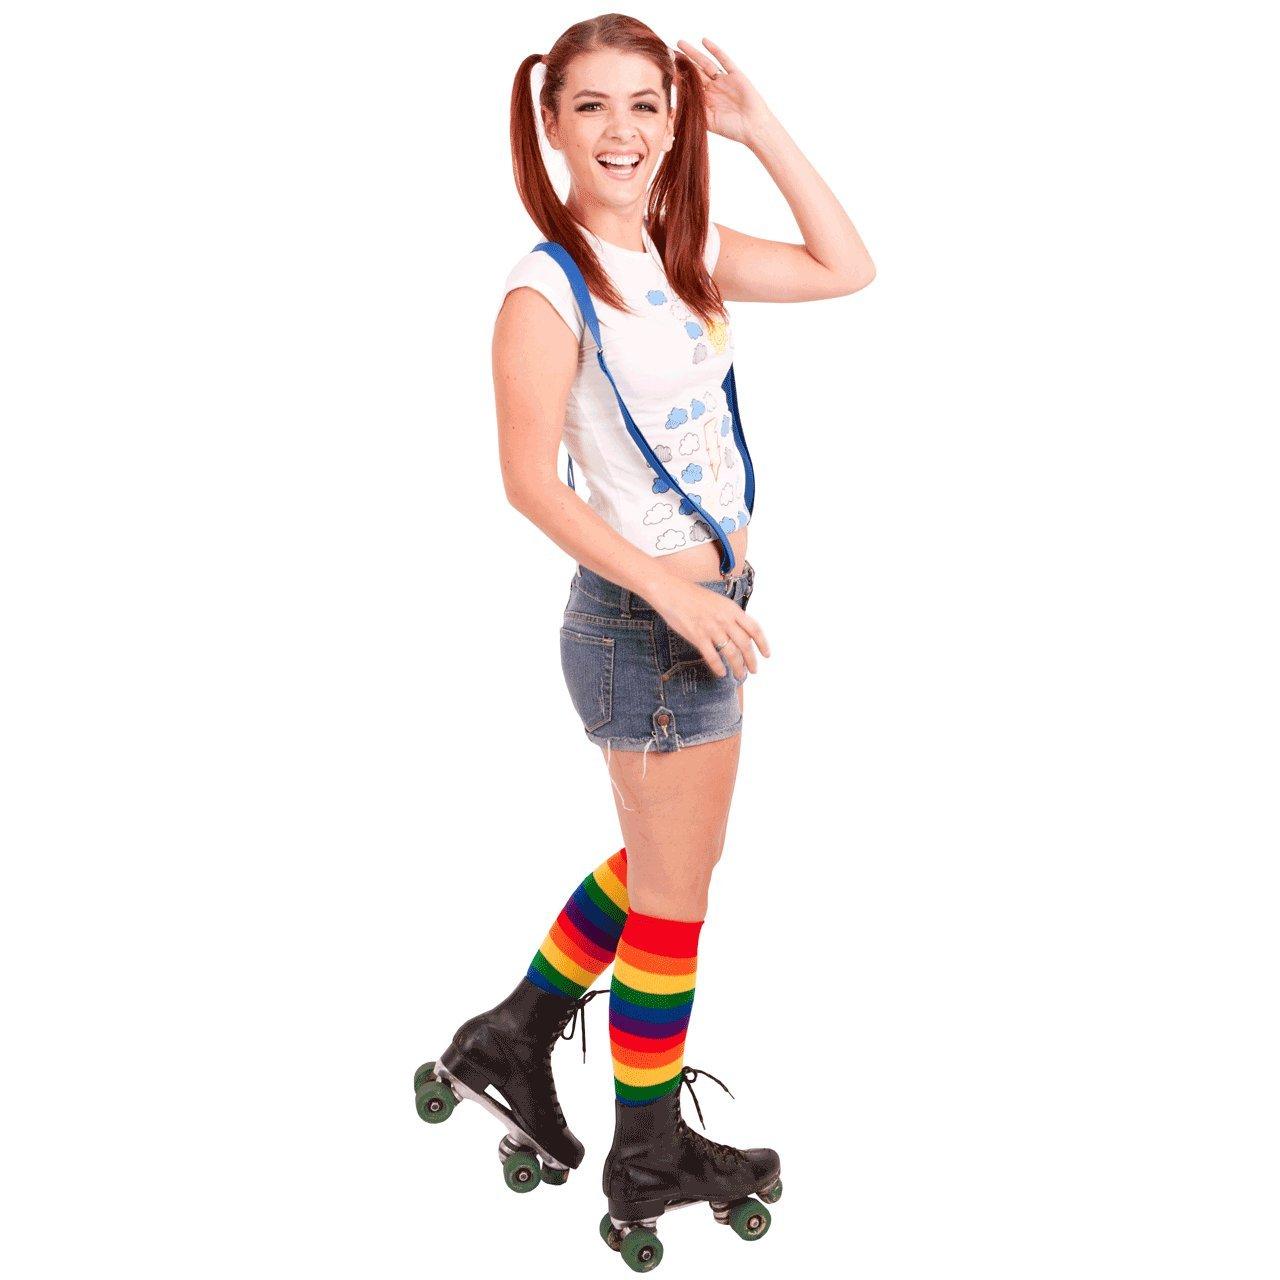 c639a5c33ef50 Chrissy's Socks Women's Rainbow Knee High Socks 7-11 Red / Orange / Yellow  at Amazon Women's Clothing store: